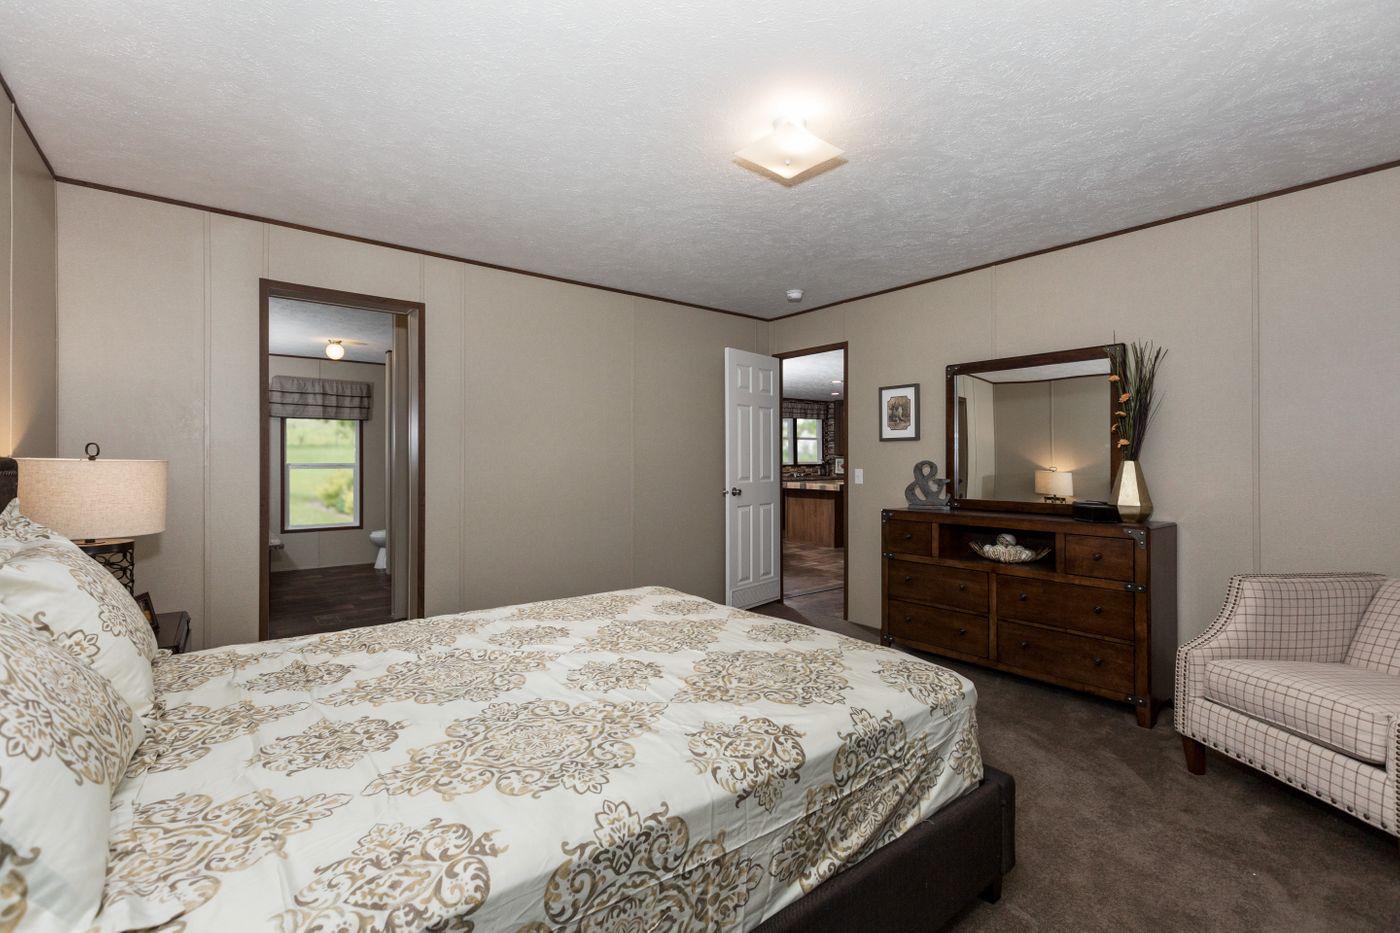 The Bayside Bedroom